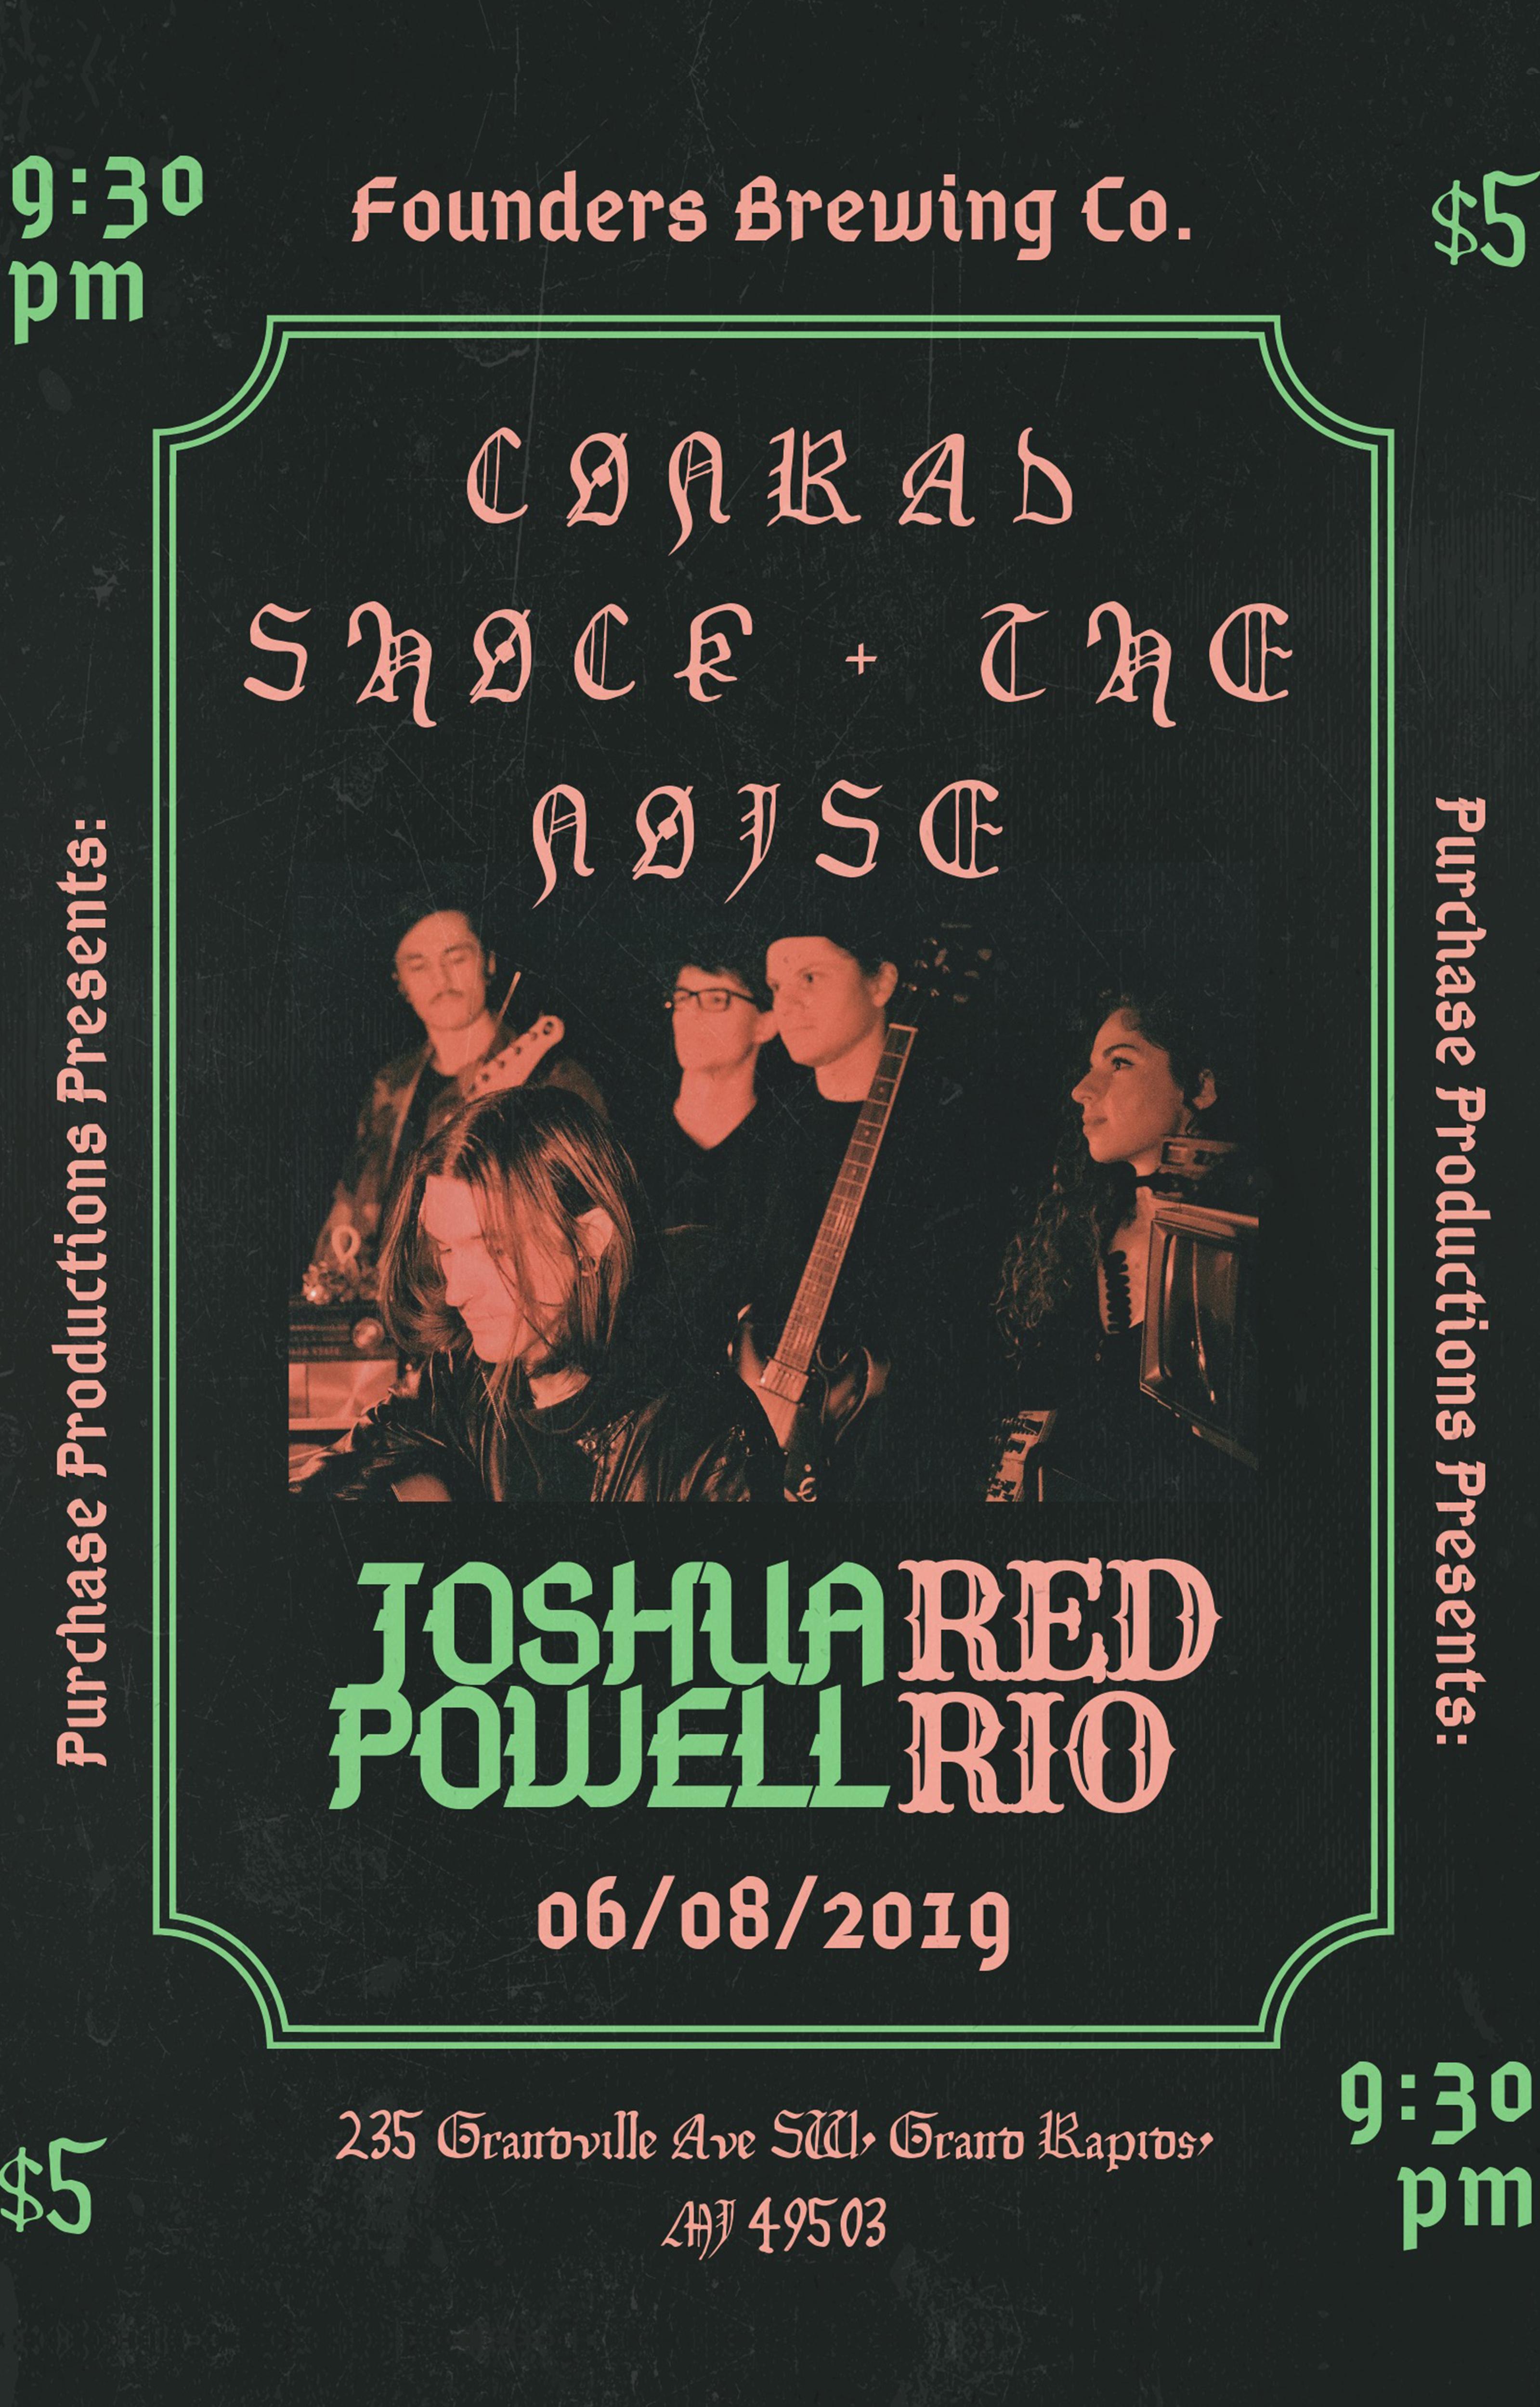 Conrad Shock event poster